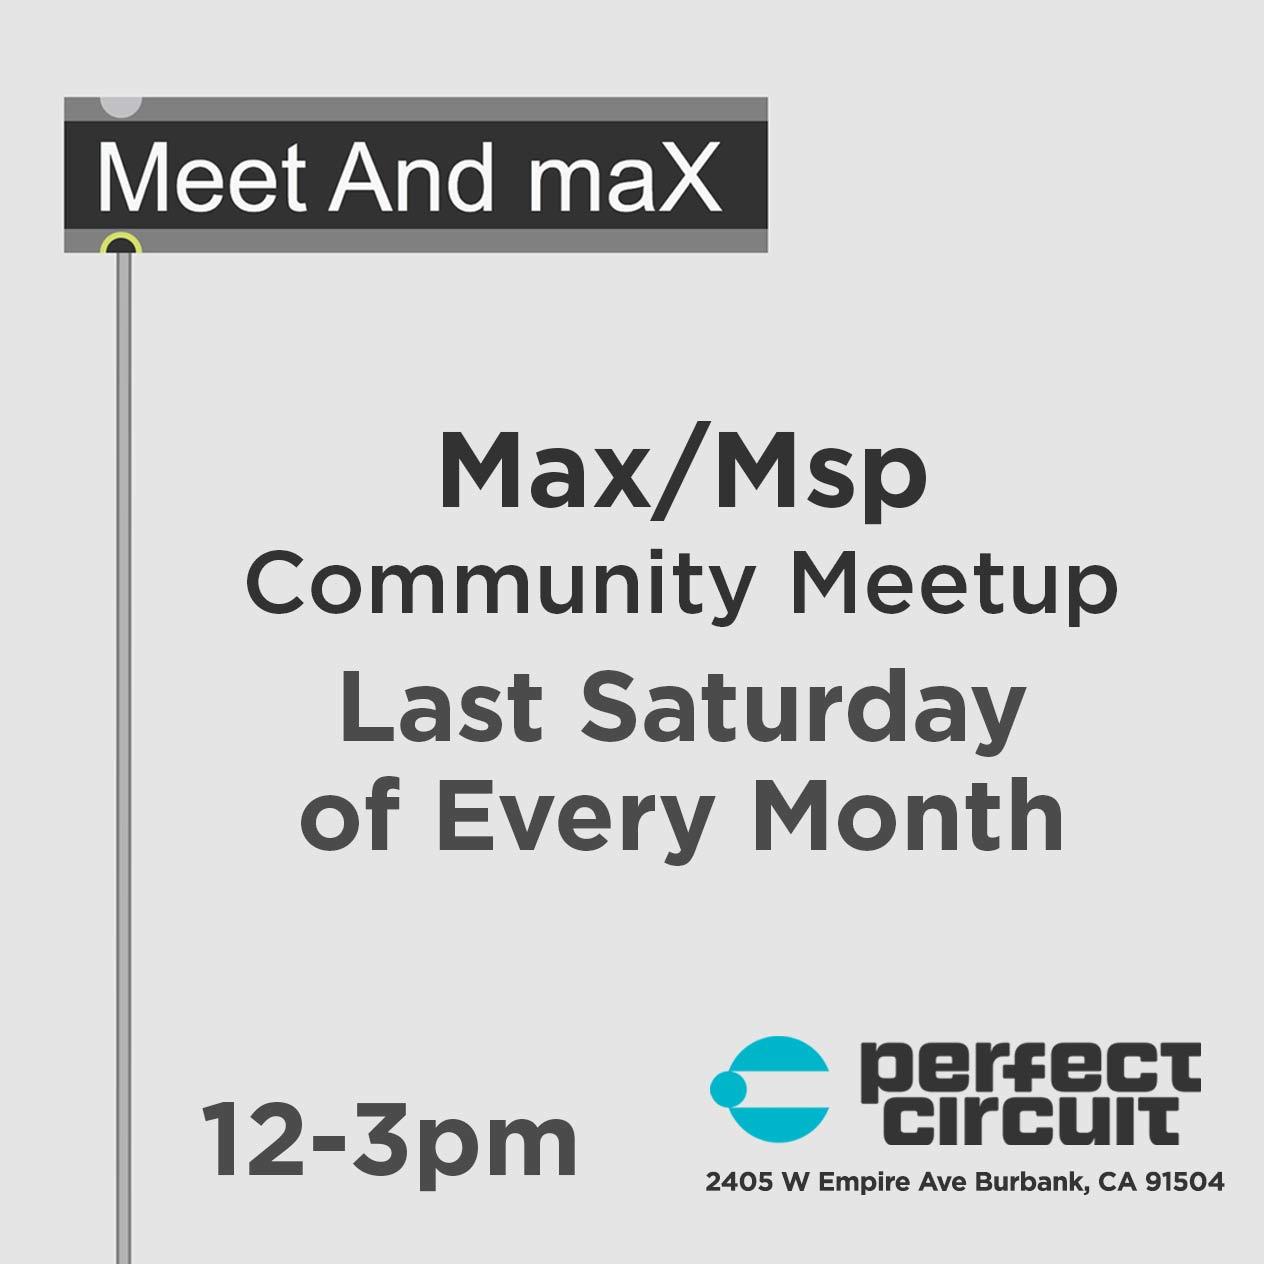 Meet and maX